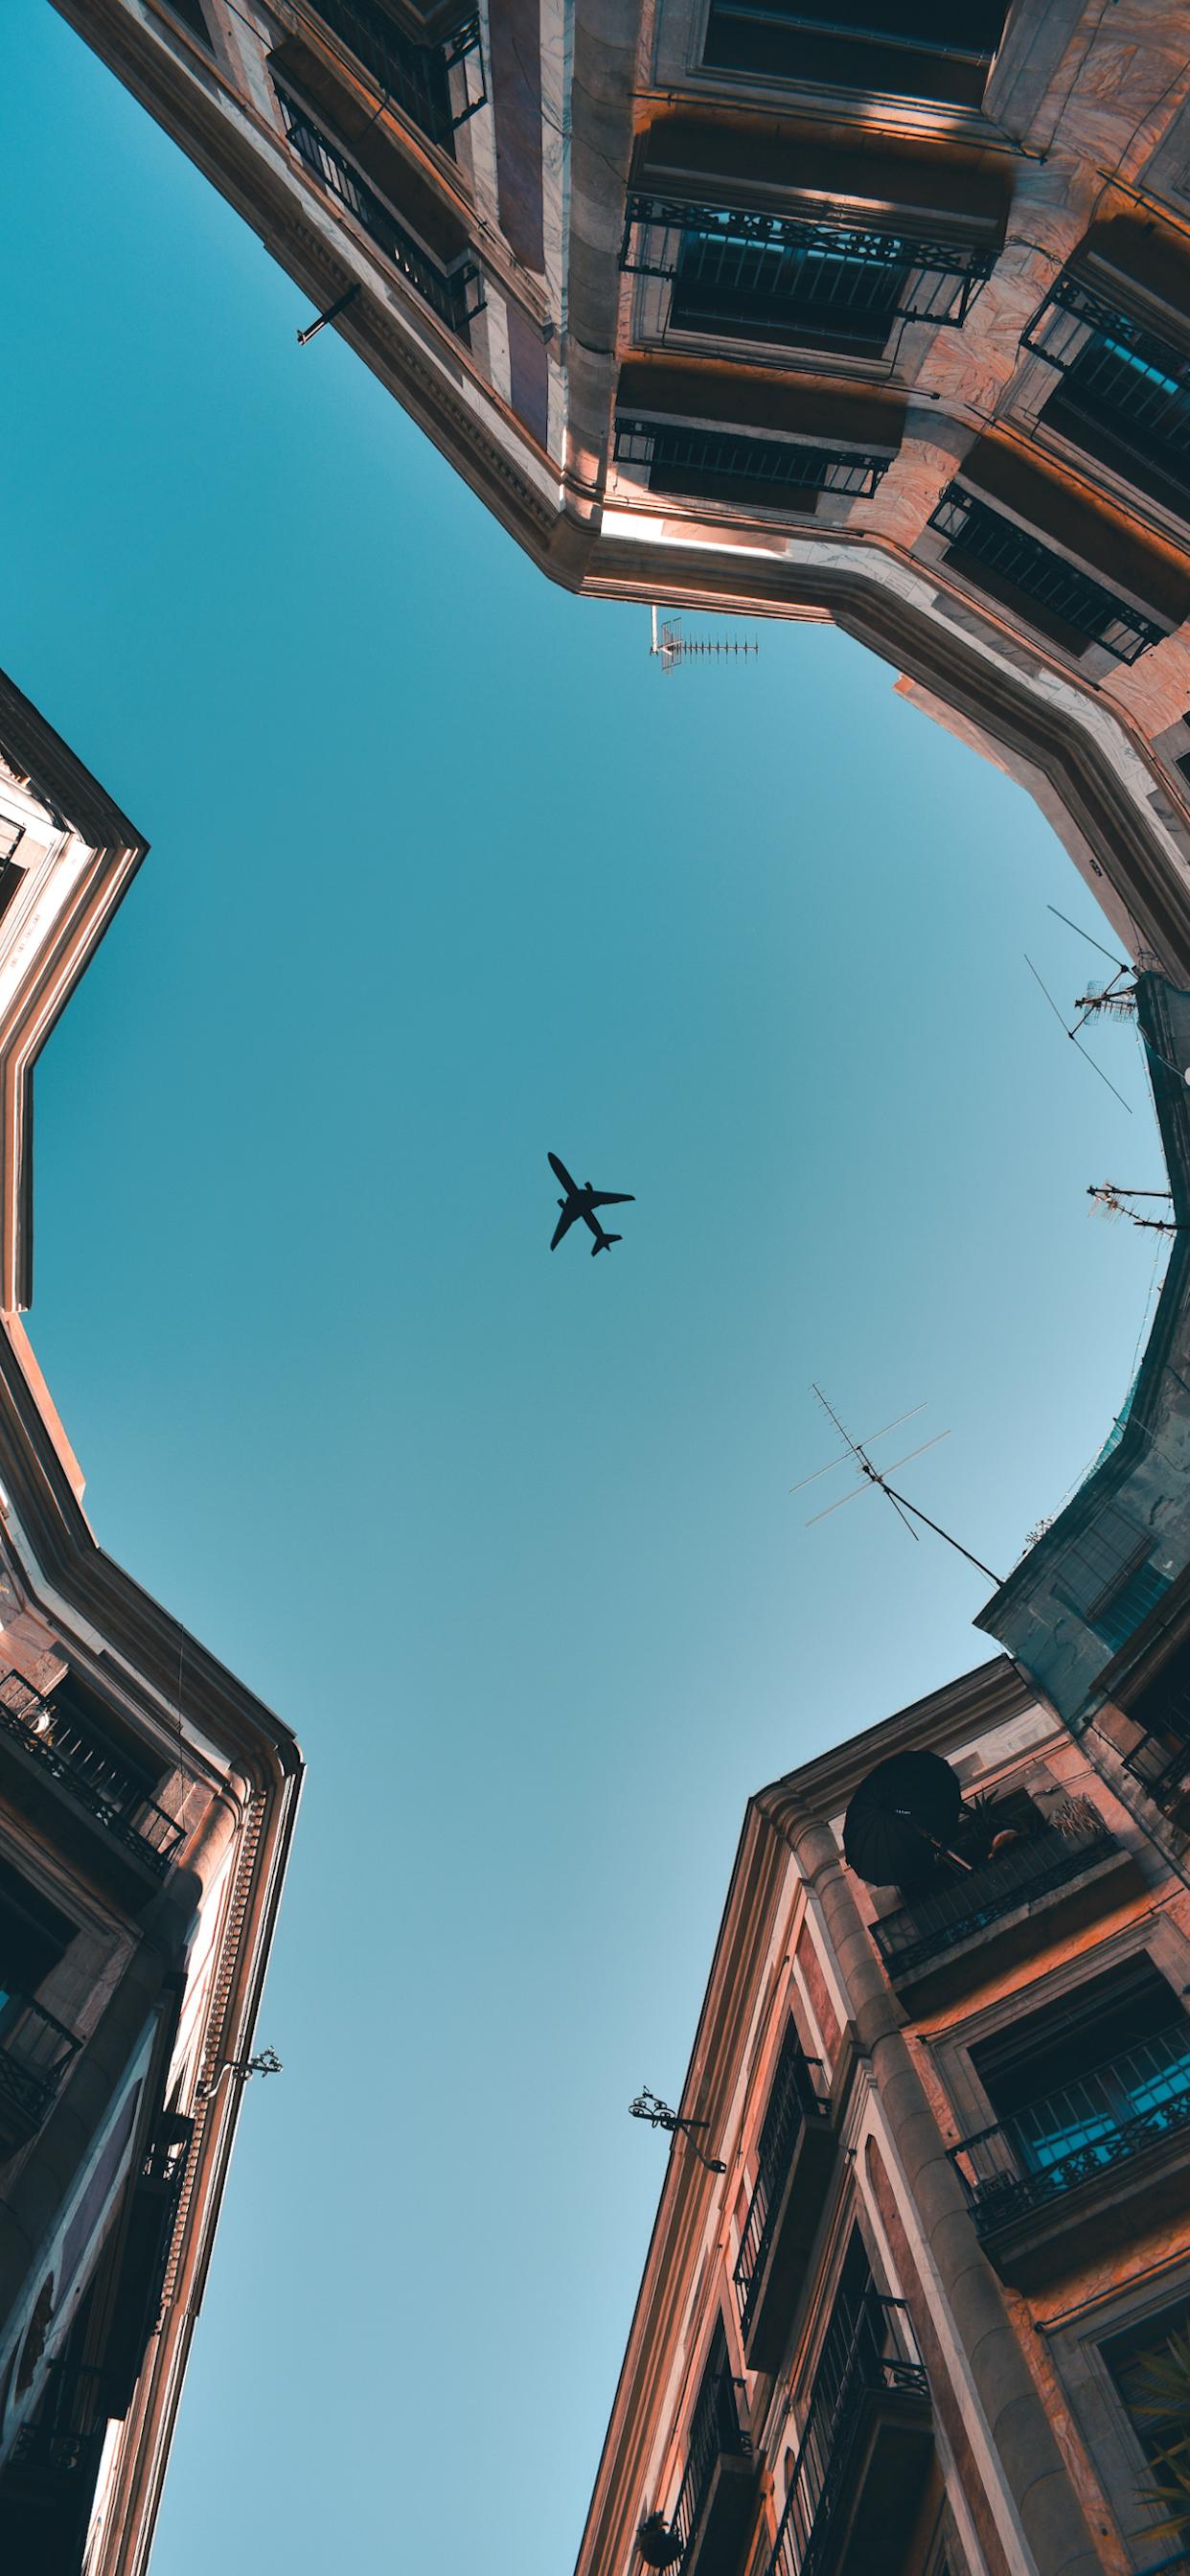 iPhone wallpapers airplane barcelona Fonds d'écran iPhone du 13/08/2019